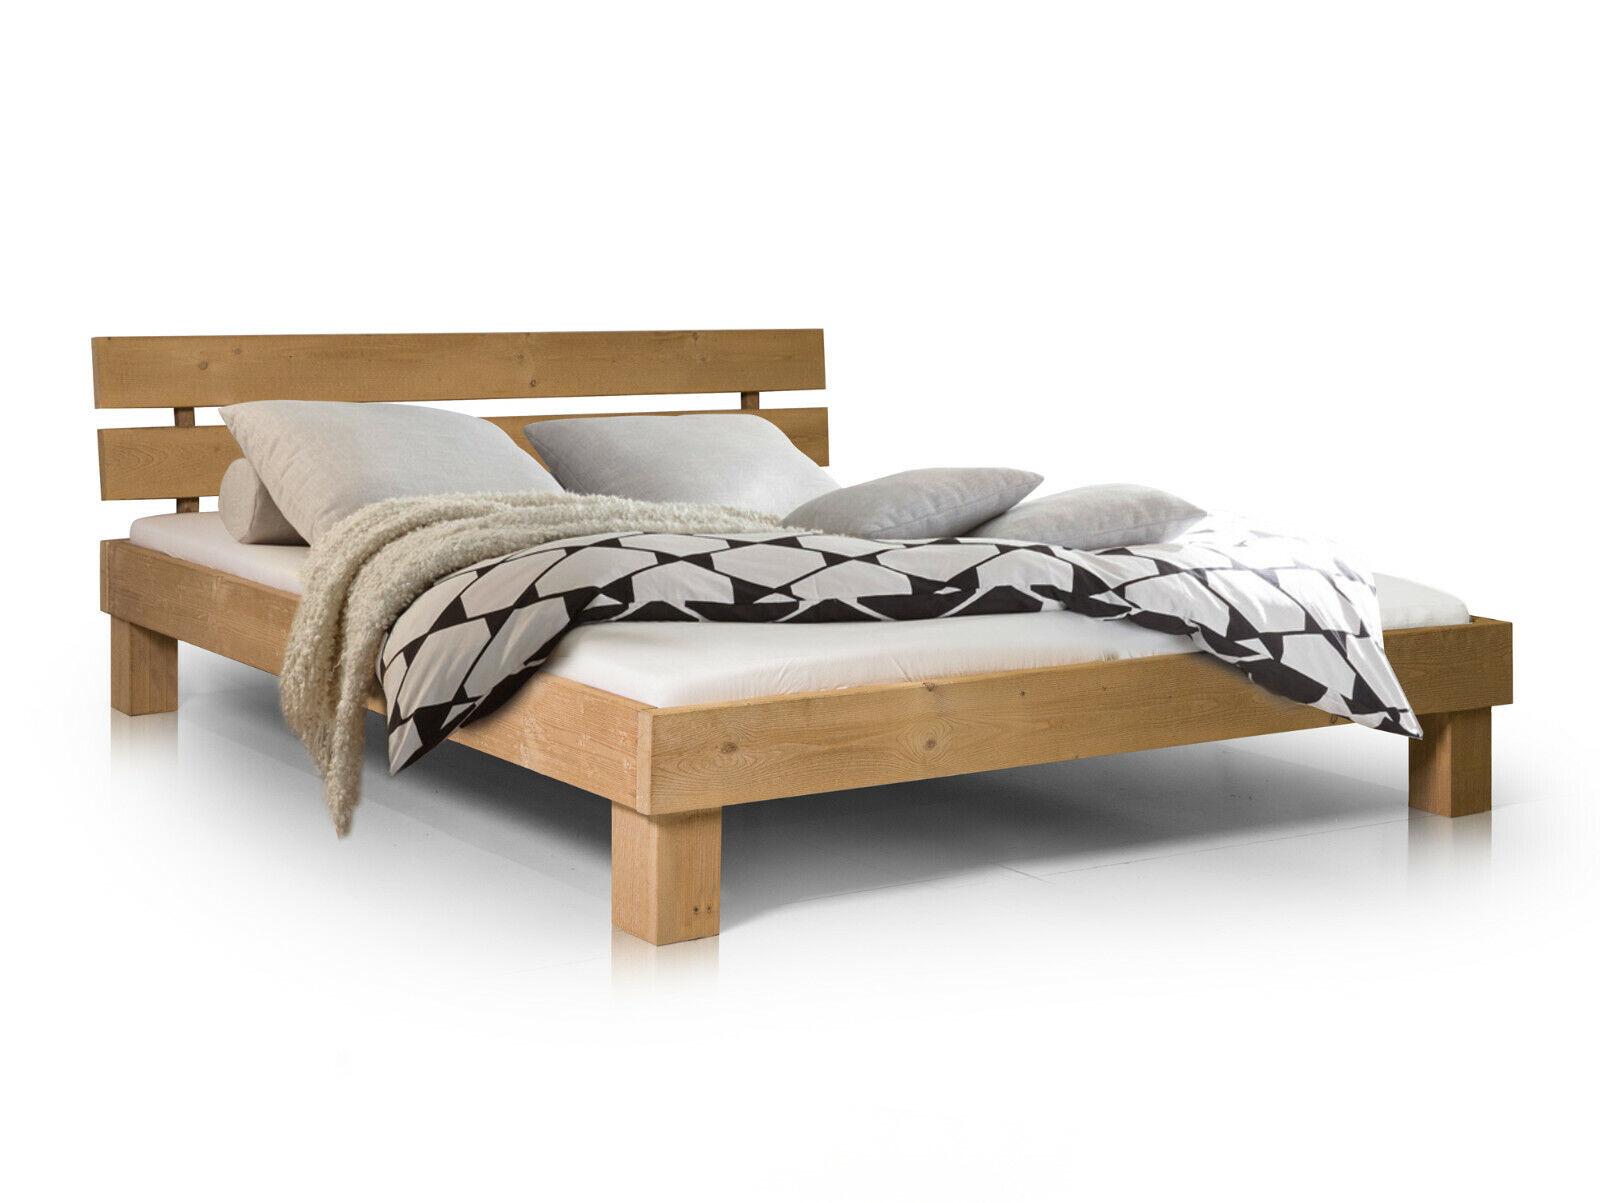 Bett Massivholzbett Doppelbett PUMBA alle Größen Fichte 3 Farben 100%Handarbeit